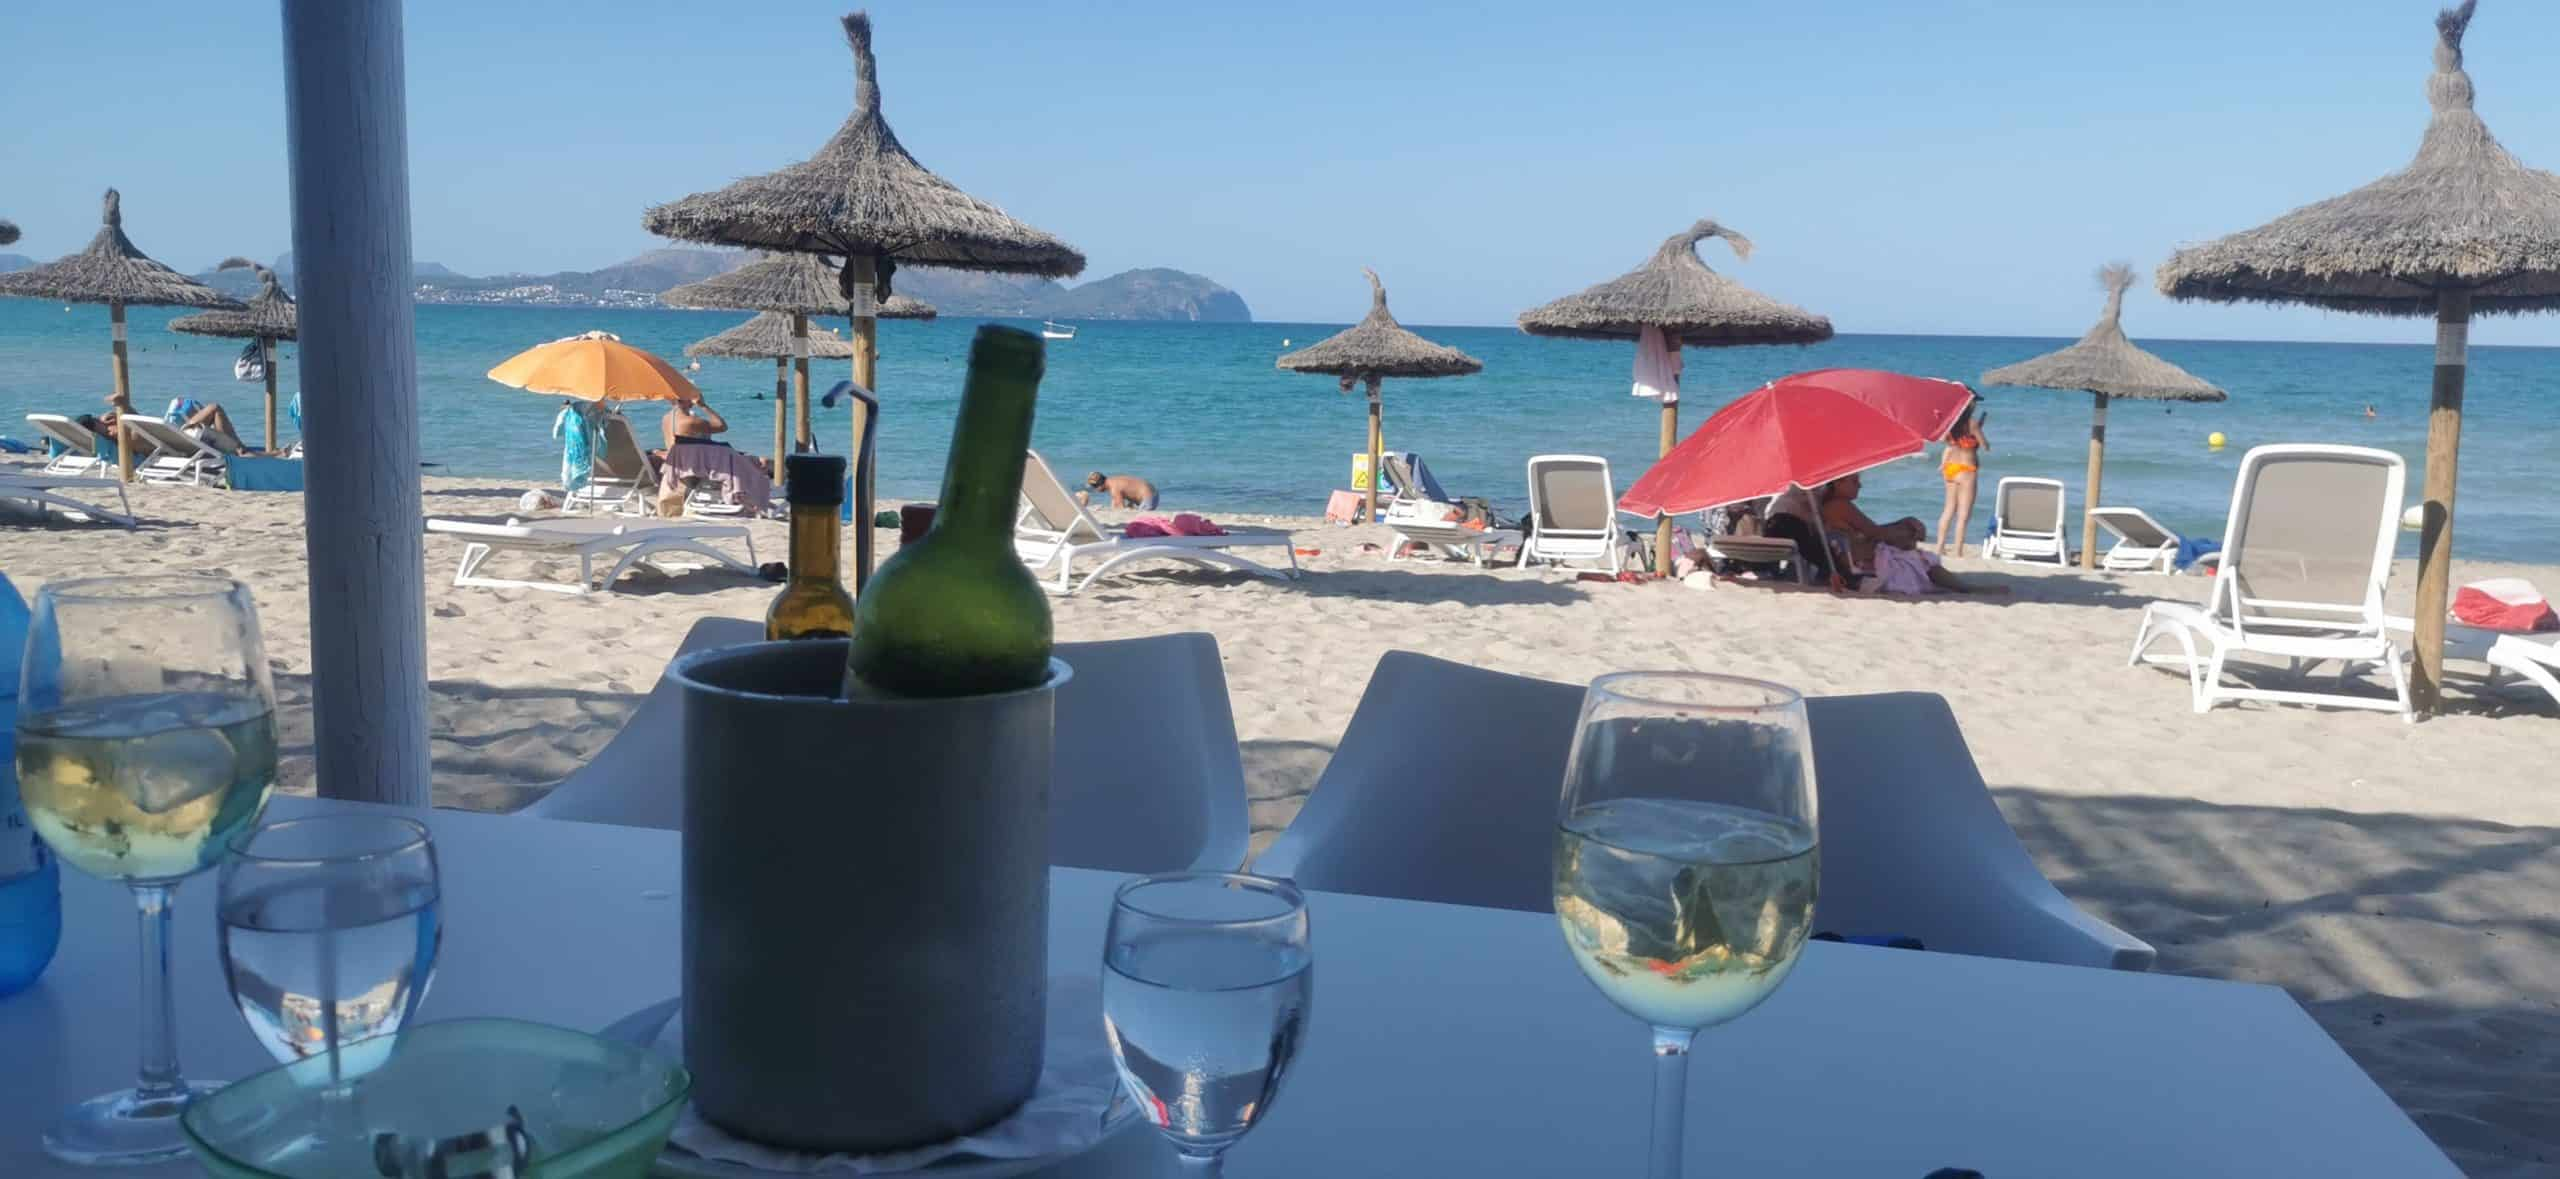 Playa de Muro Ausblick Restaurant Opa_Oma